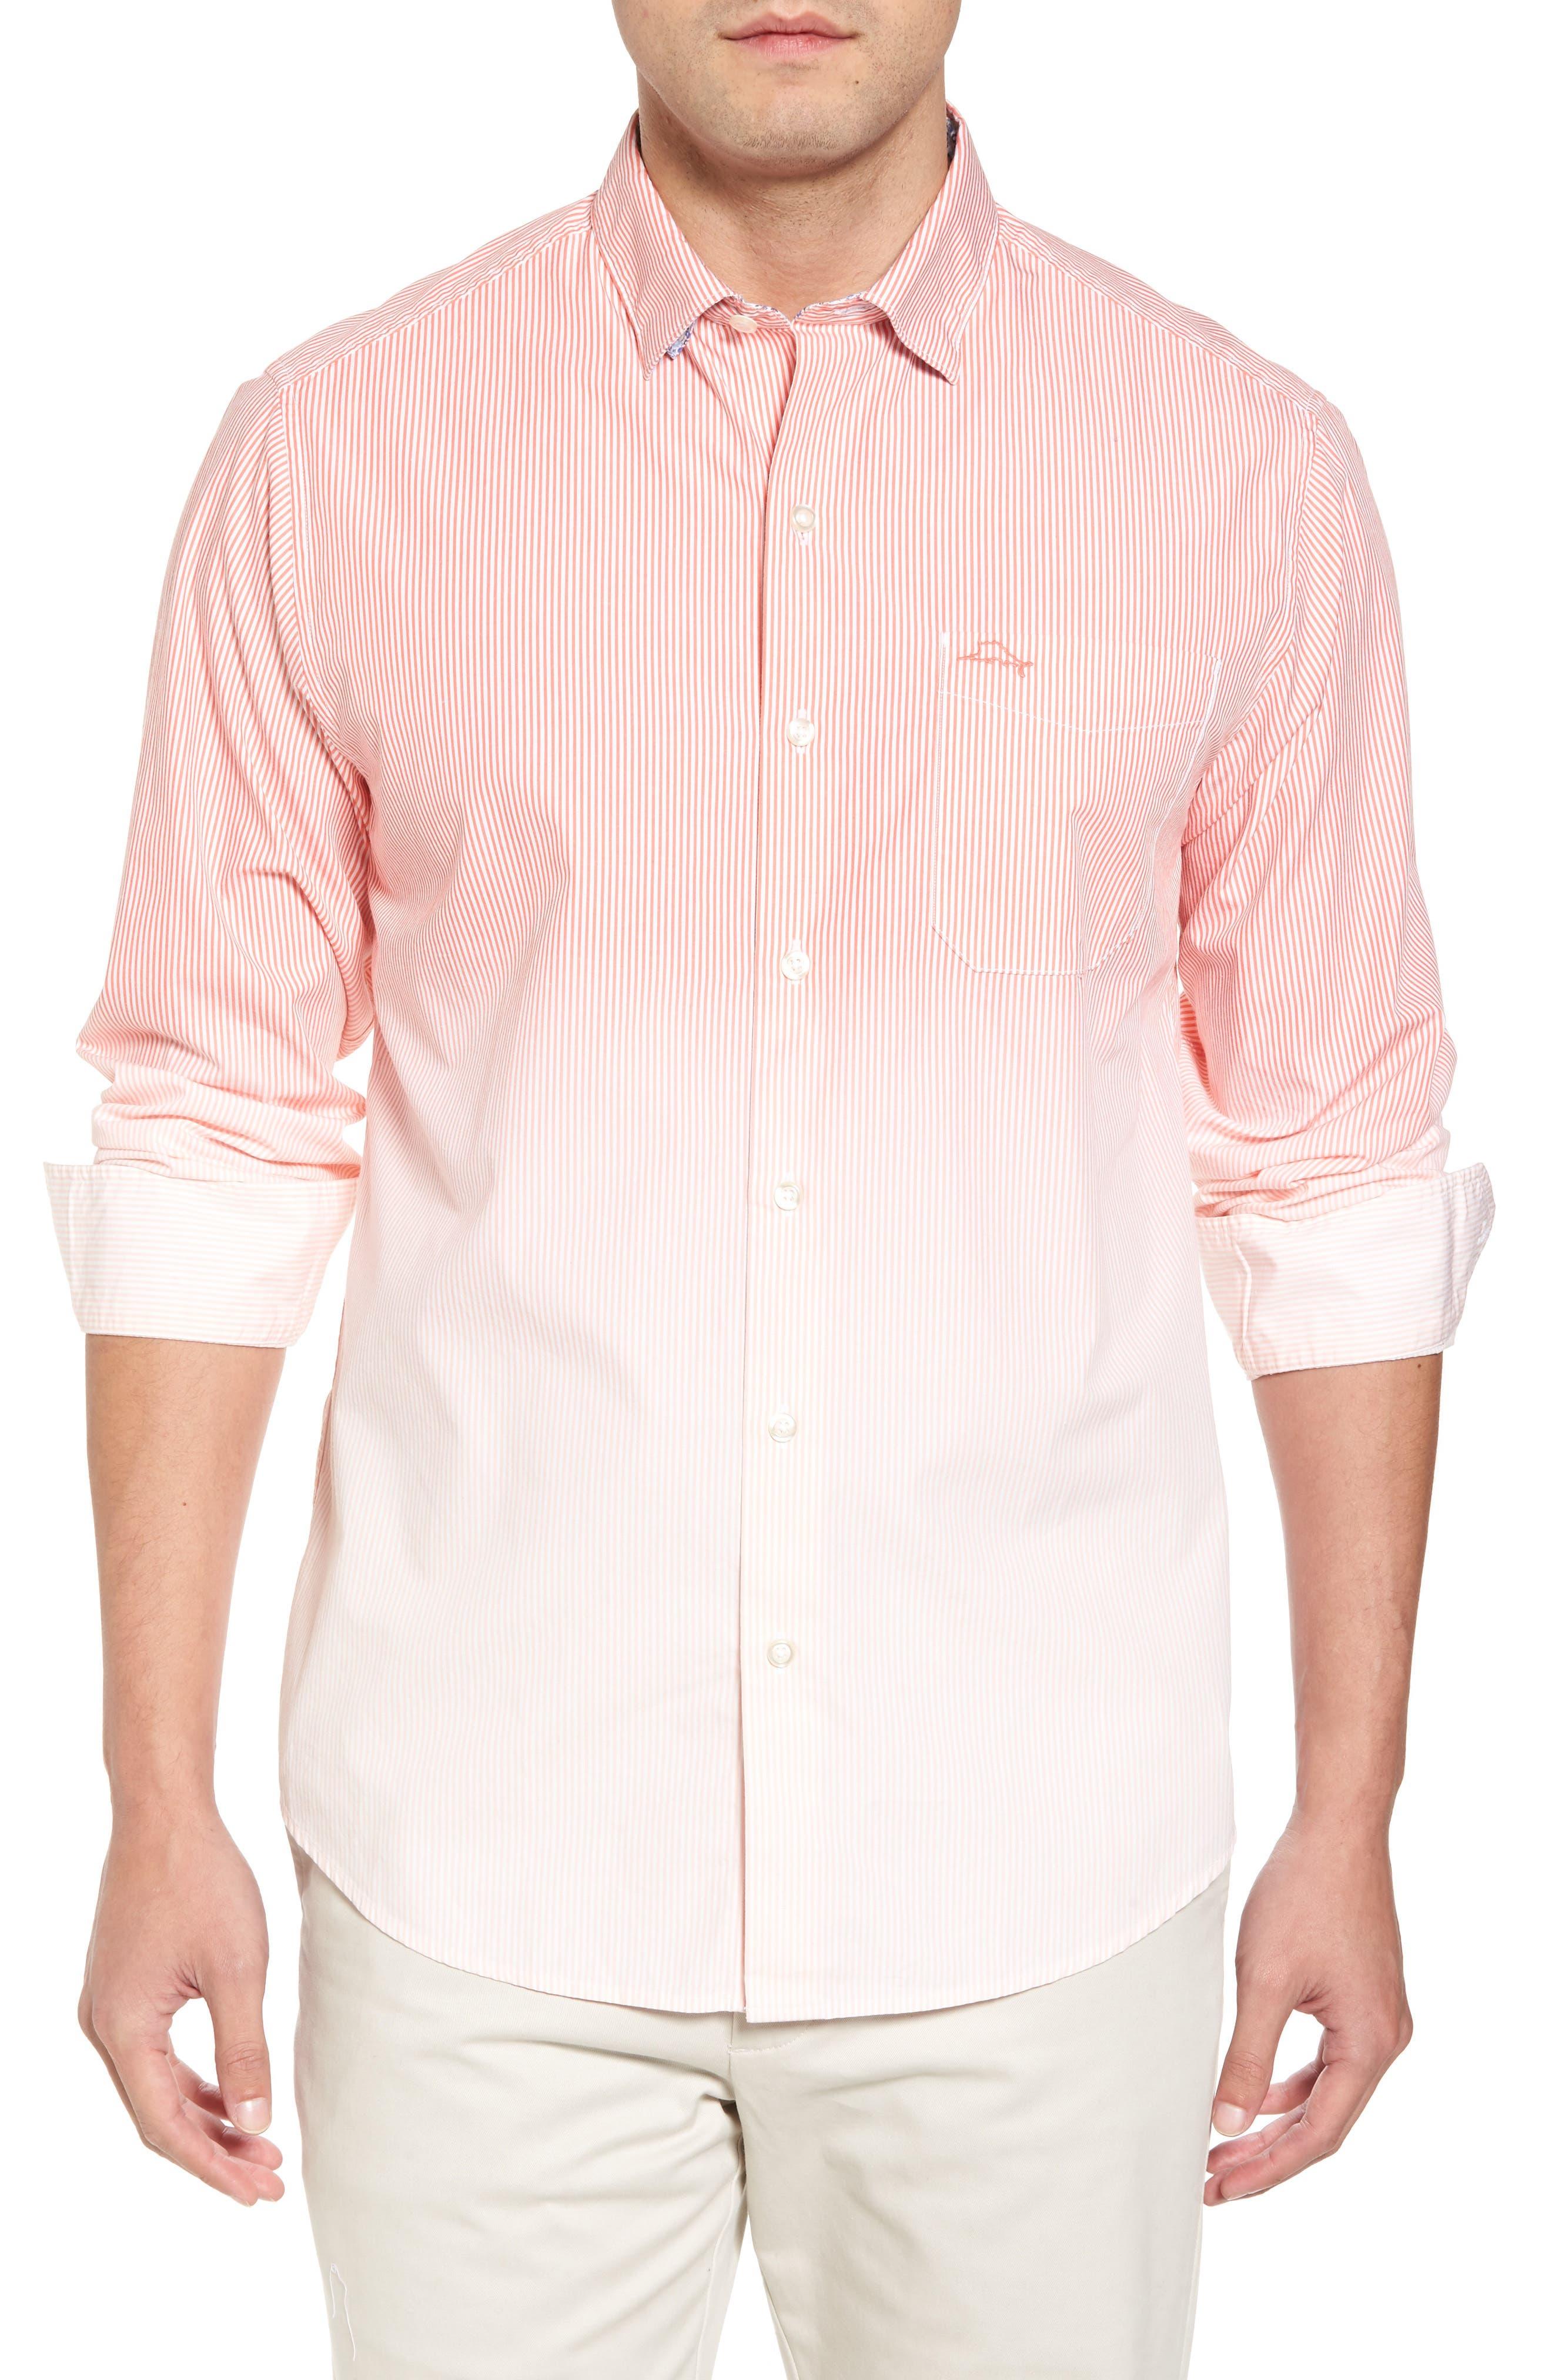 Fadeaway Beach Sport Shirt,                             Main thumbnail 1, color,                             Burnt Coral